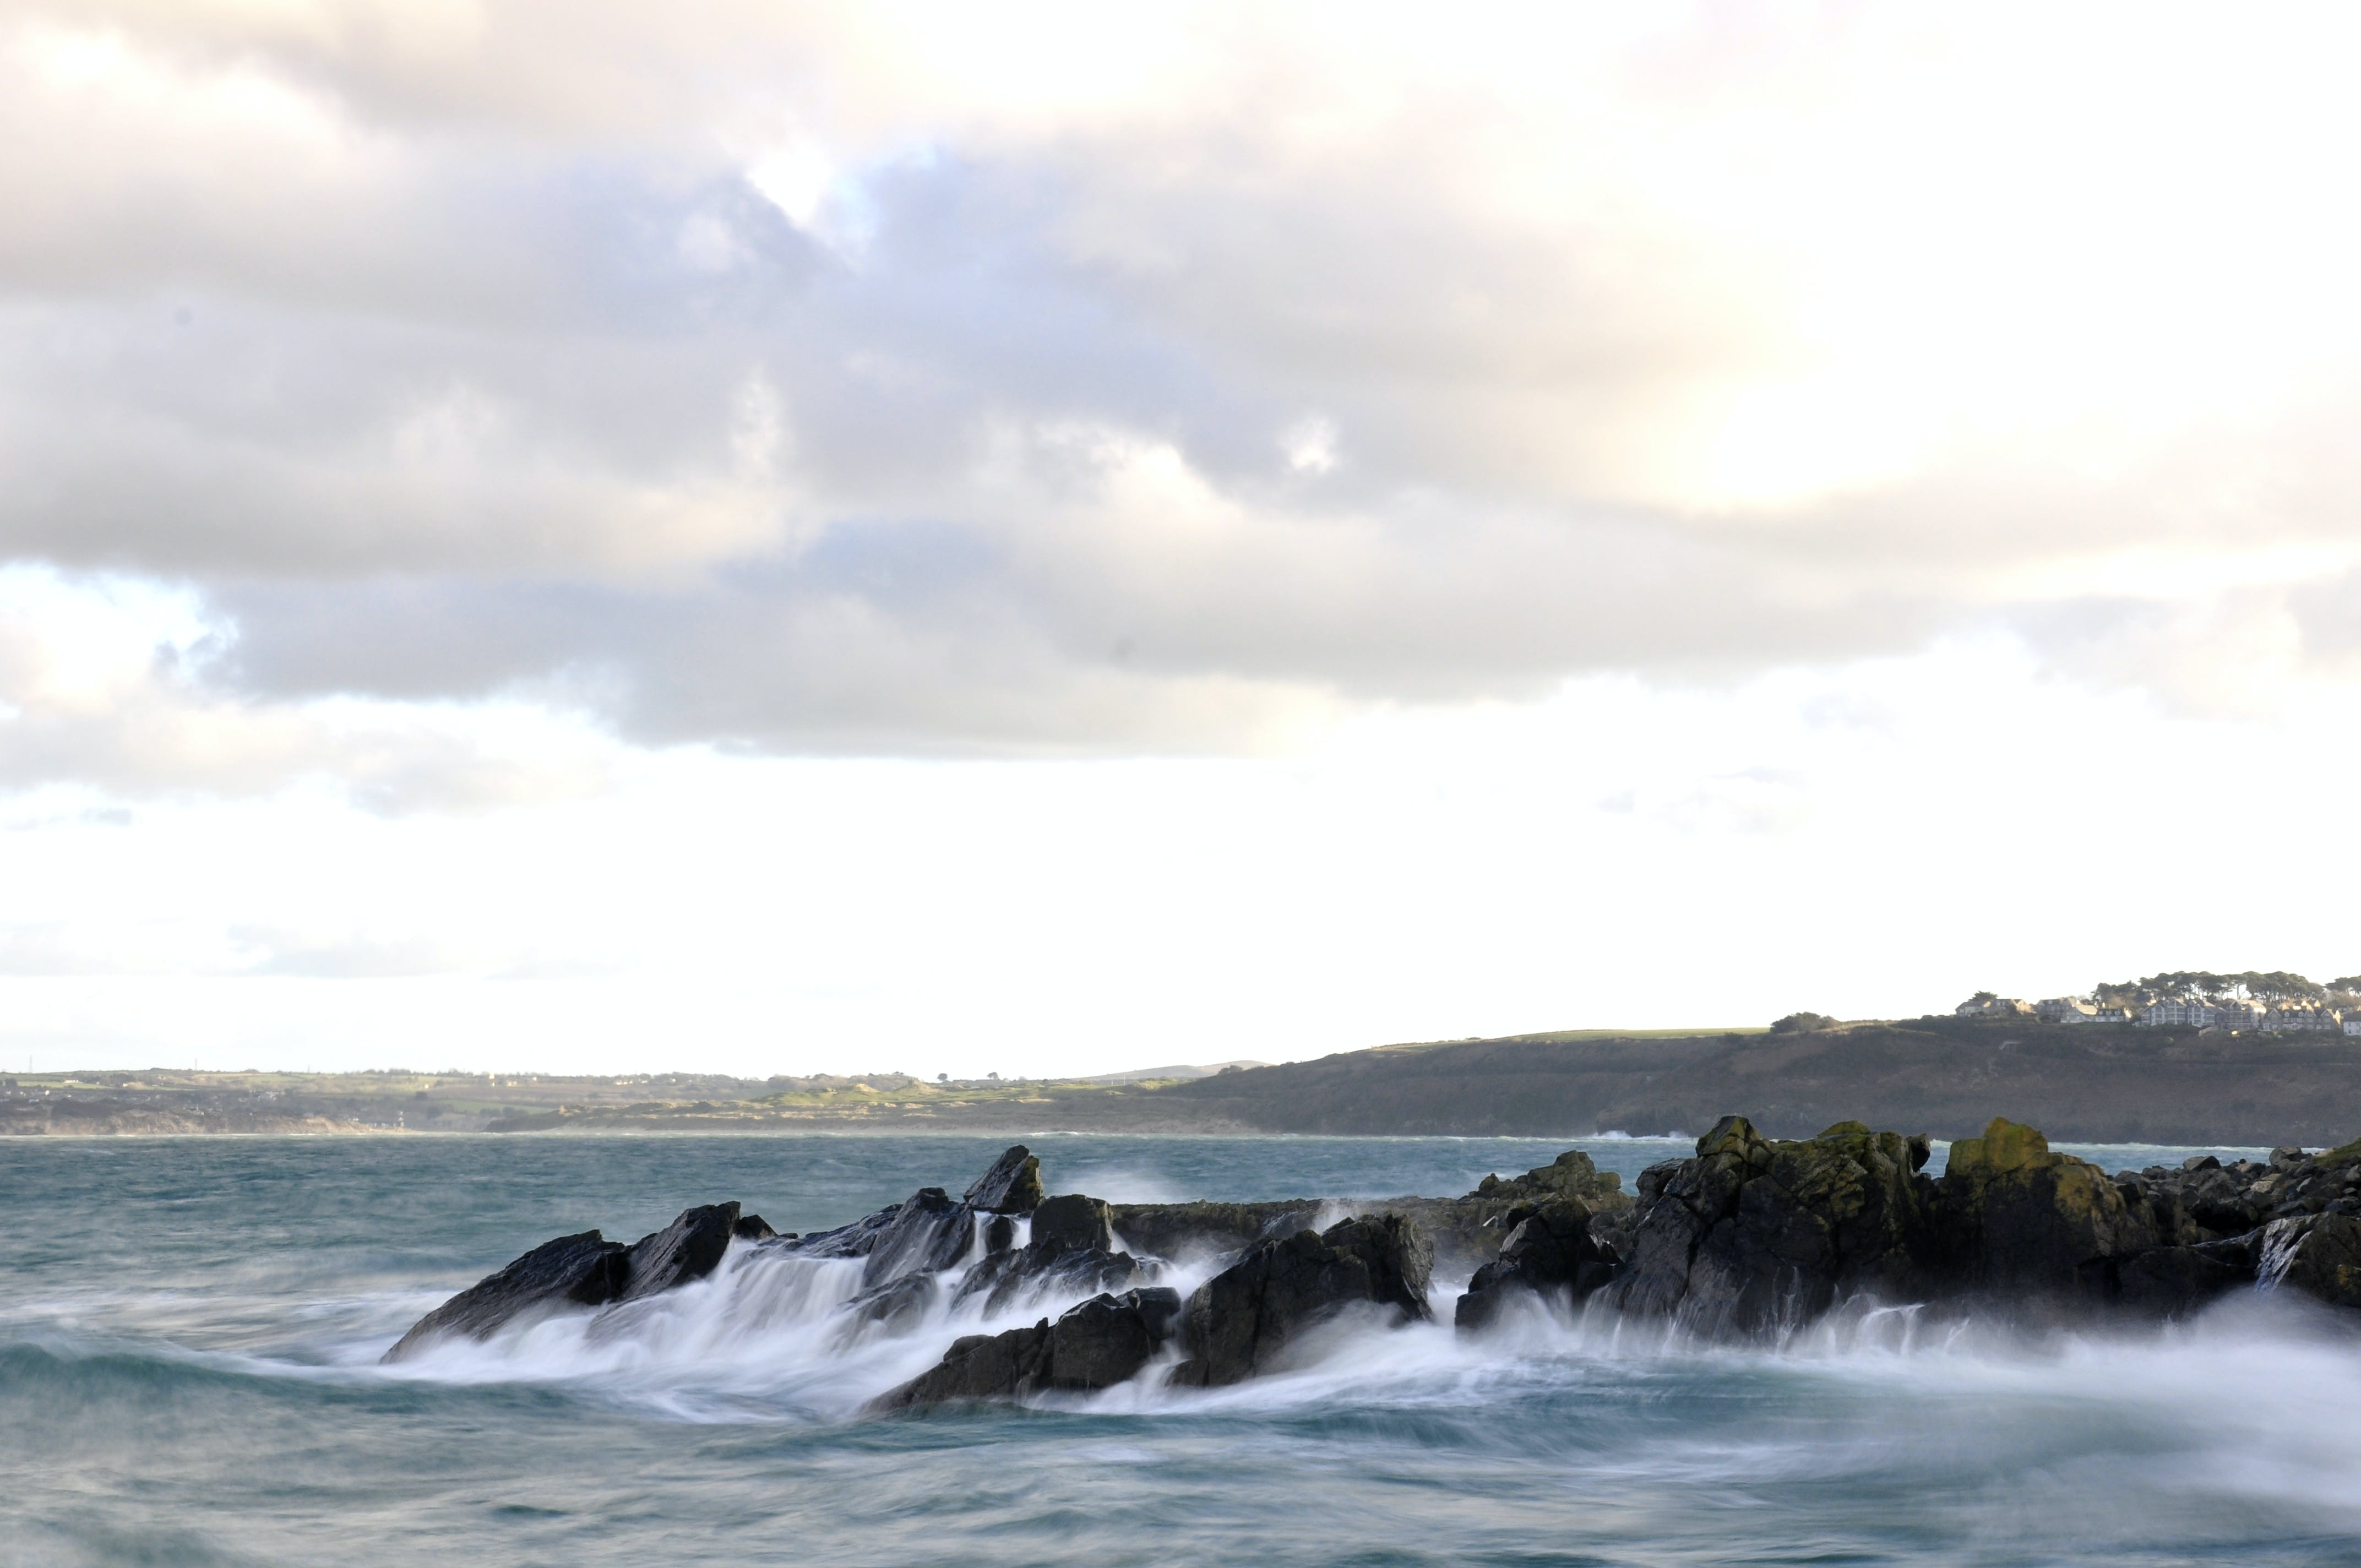 Free stock photo of cornwall, rocks, seascape, waves breaking